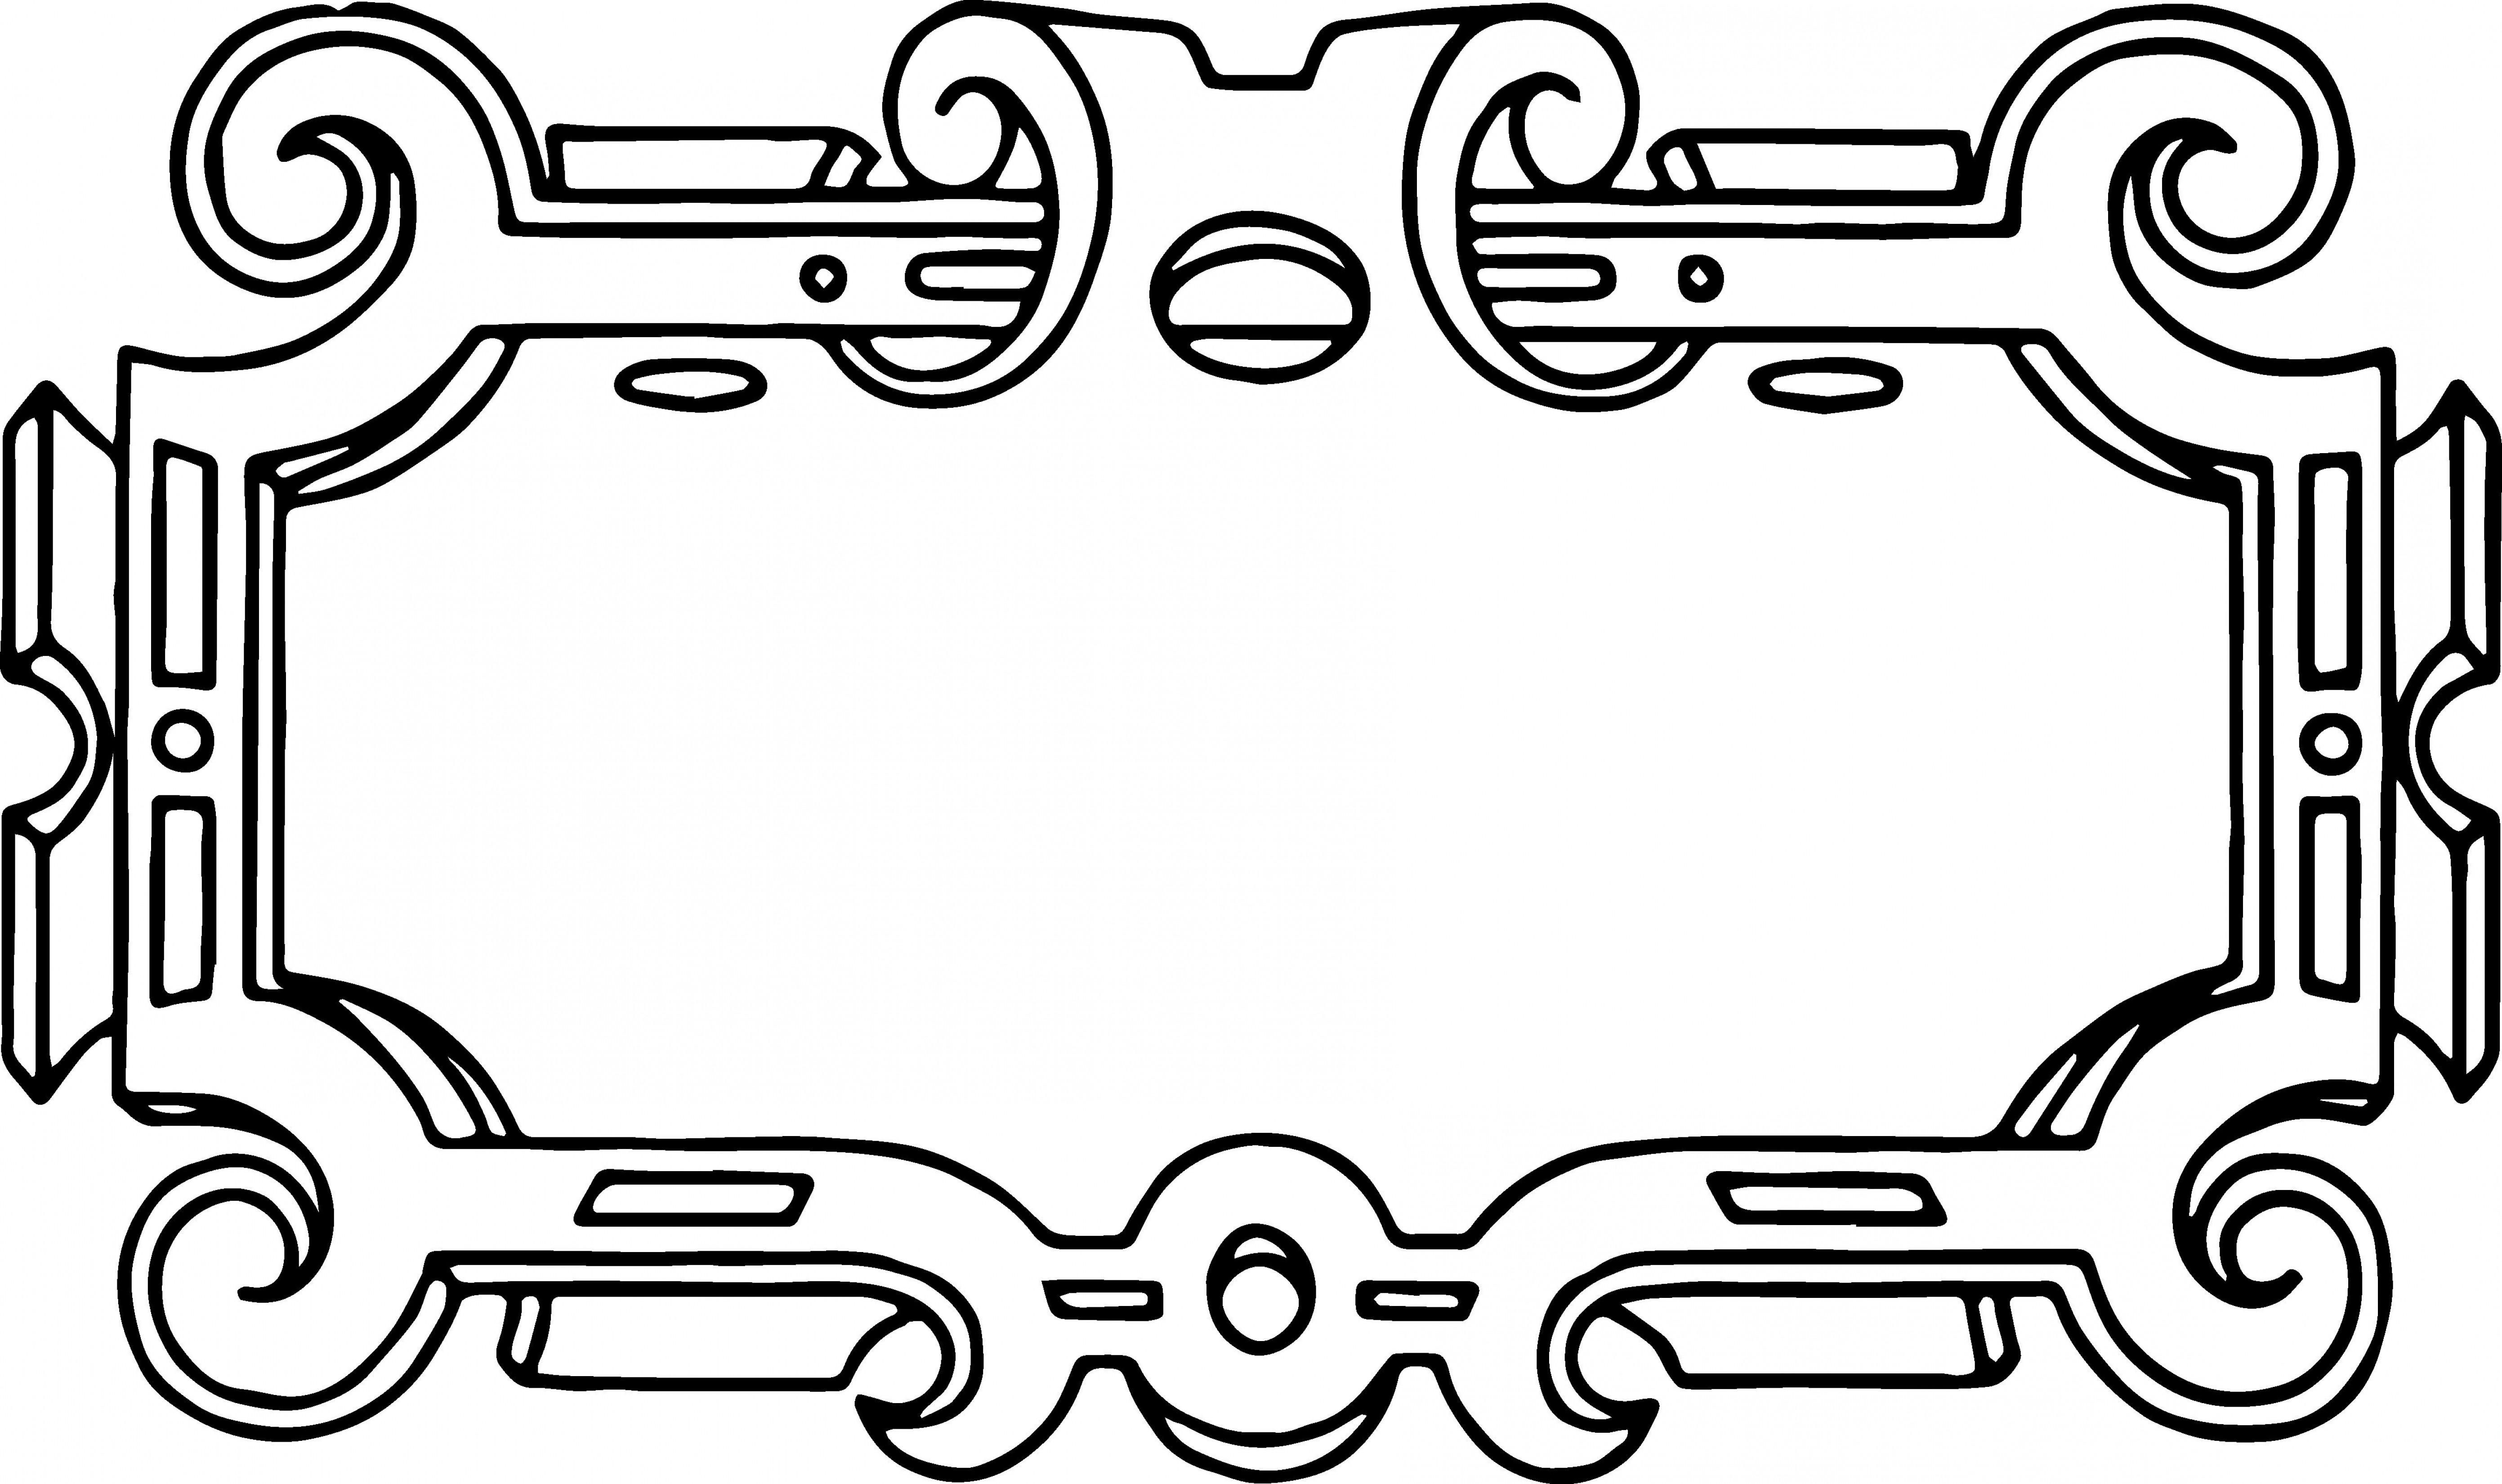 5564x3301 Free Vector Ornate Frame Border Clip Art Image Shopatcloth